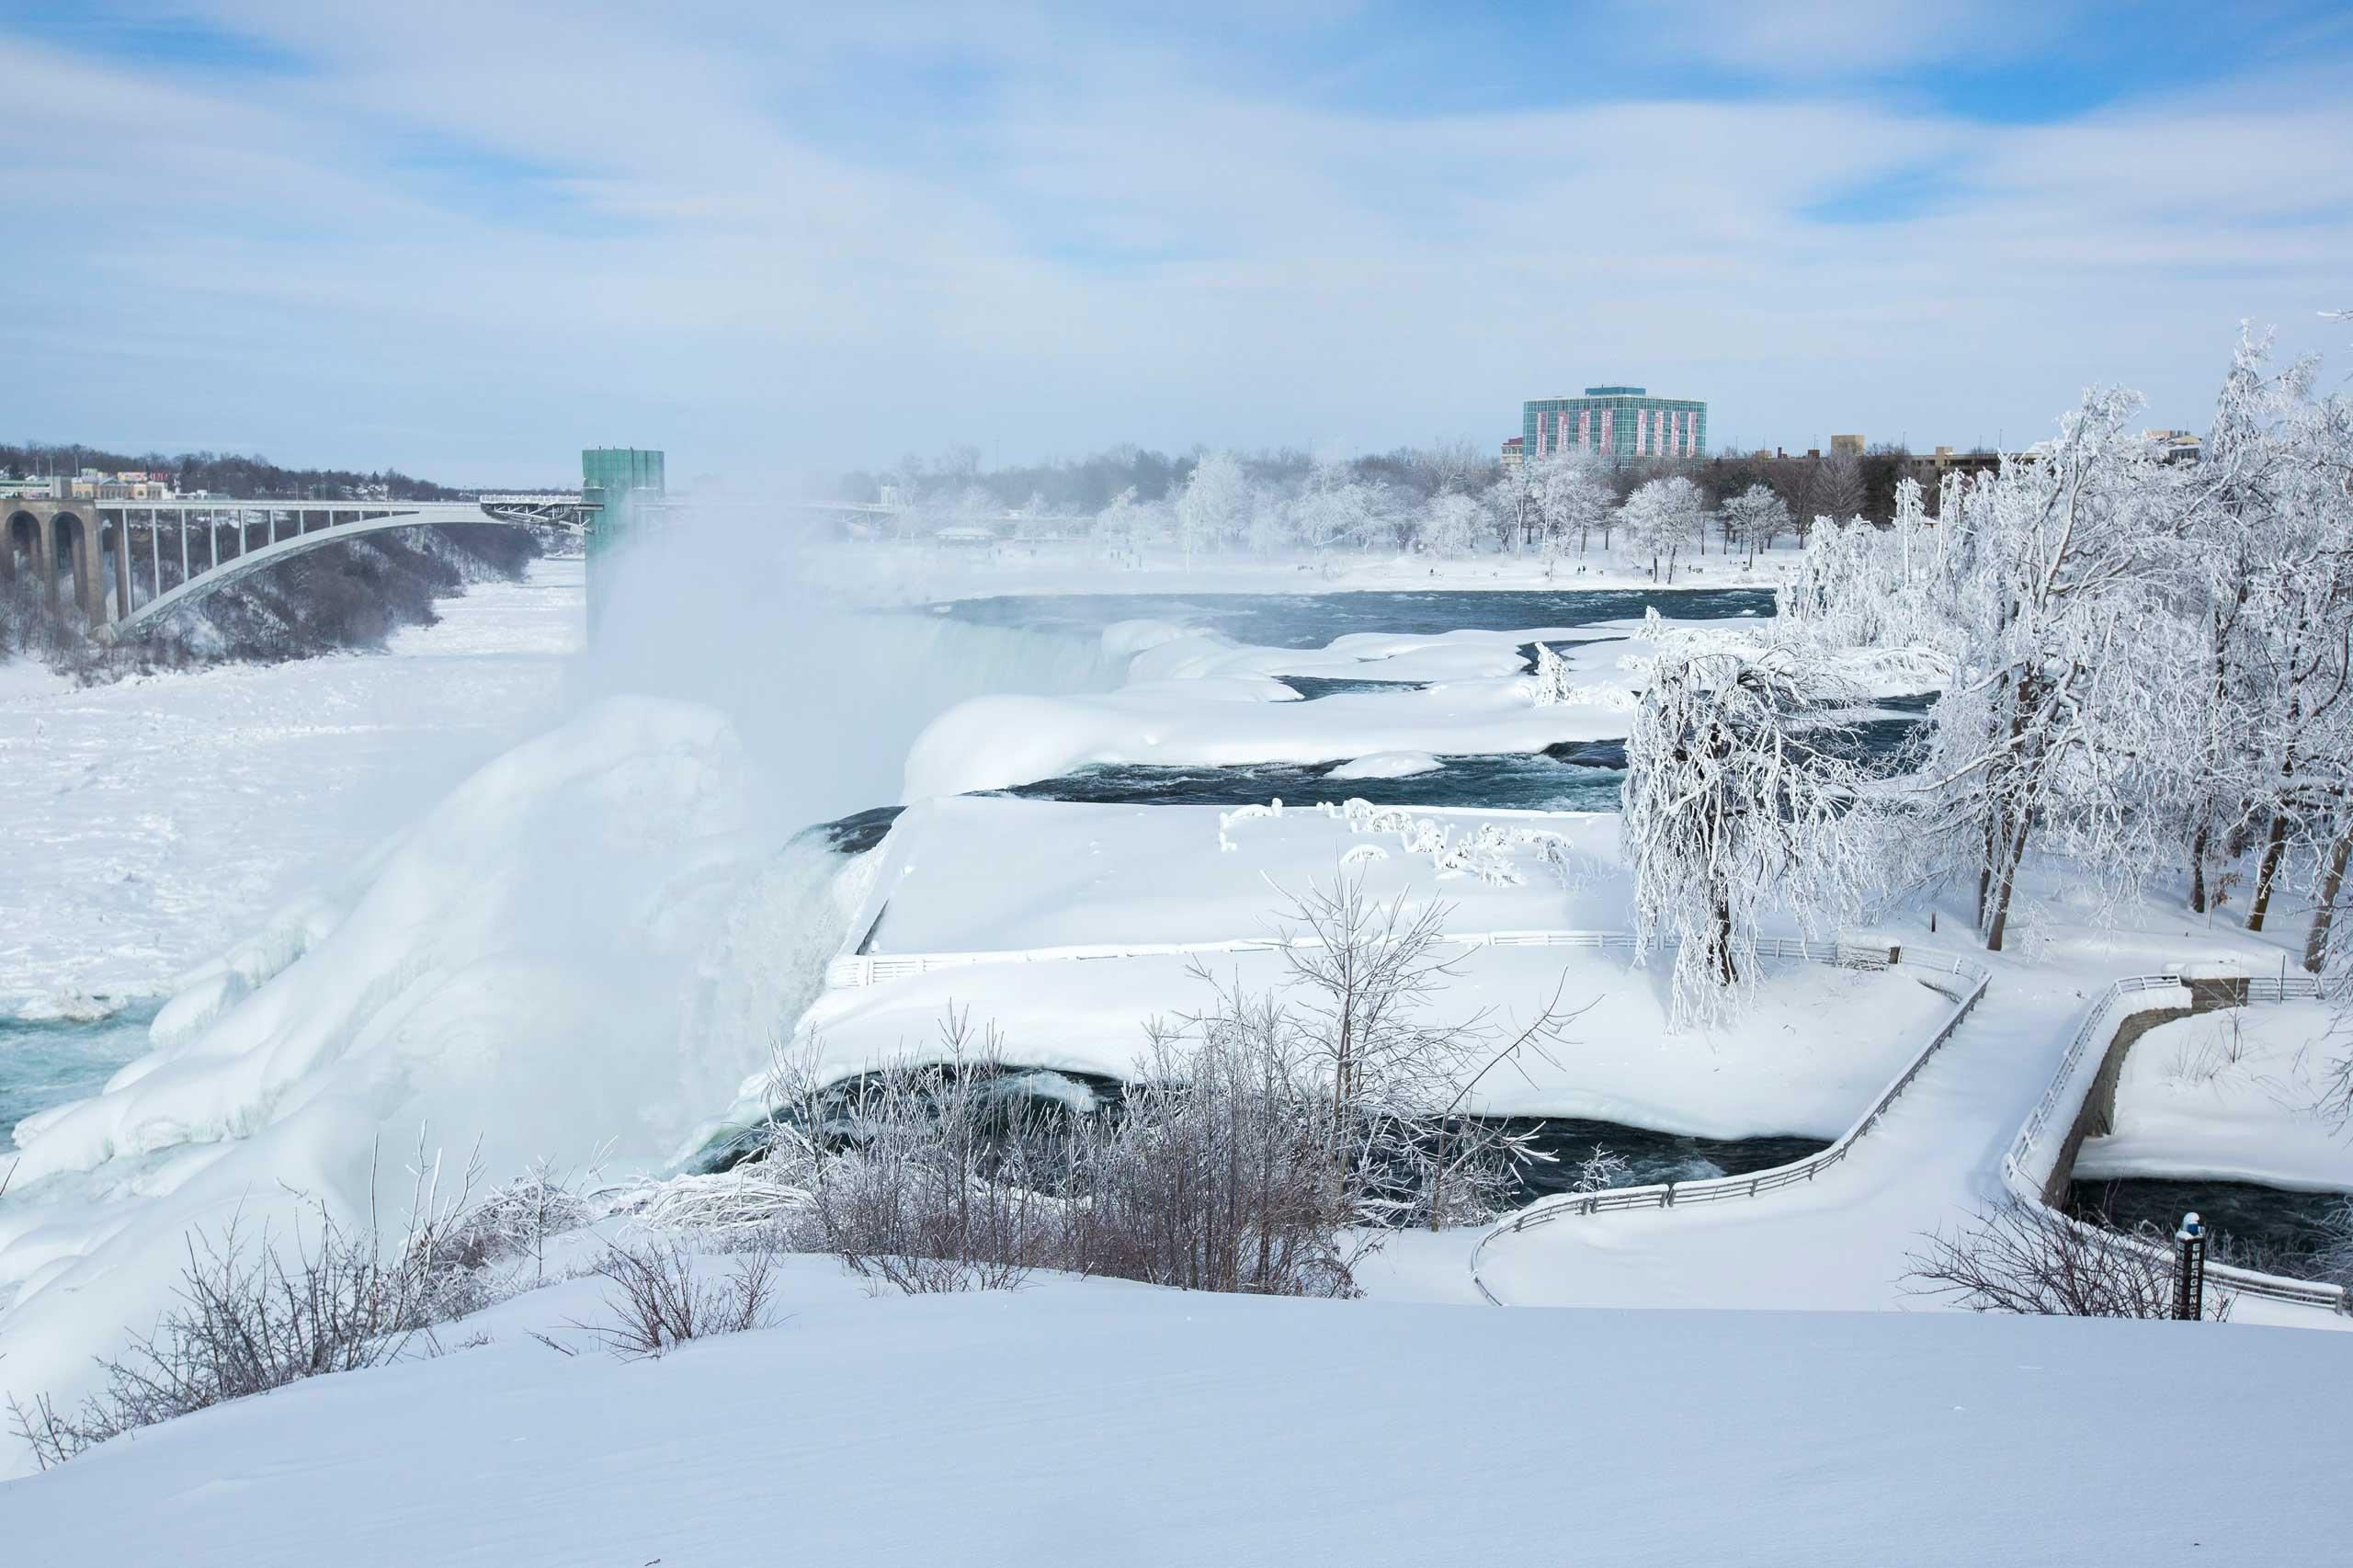 A snow-covered landscape is seen around the frozen Niagara Falls in Niagara Falls, N.Y. Feb.17, 2015.